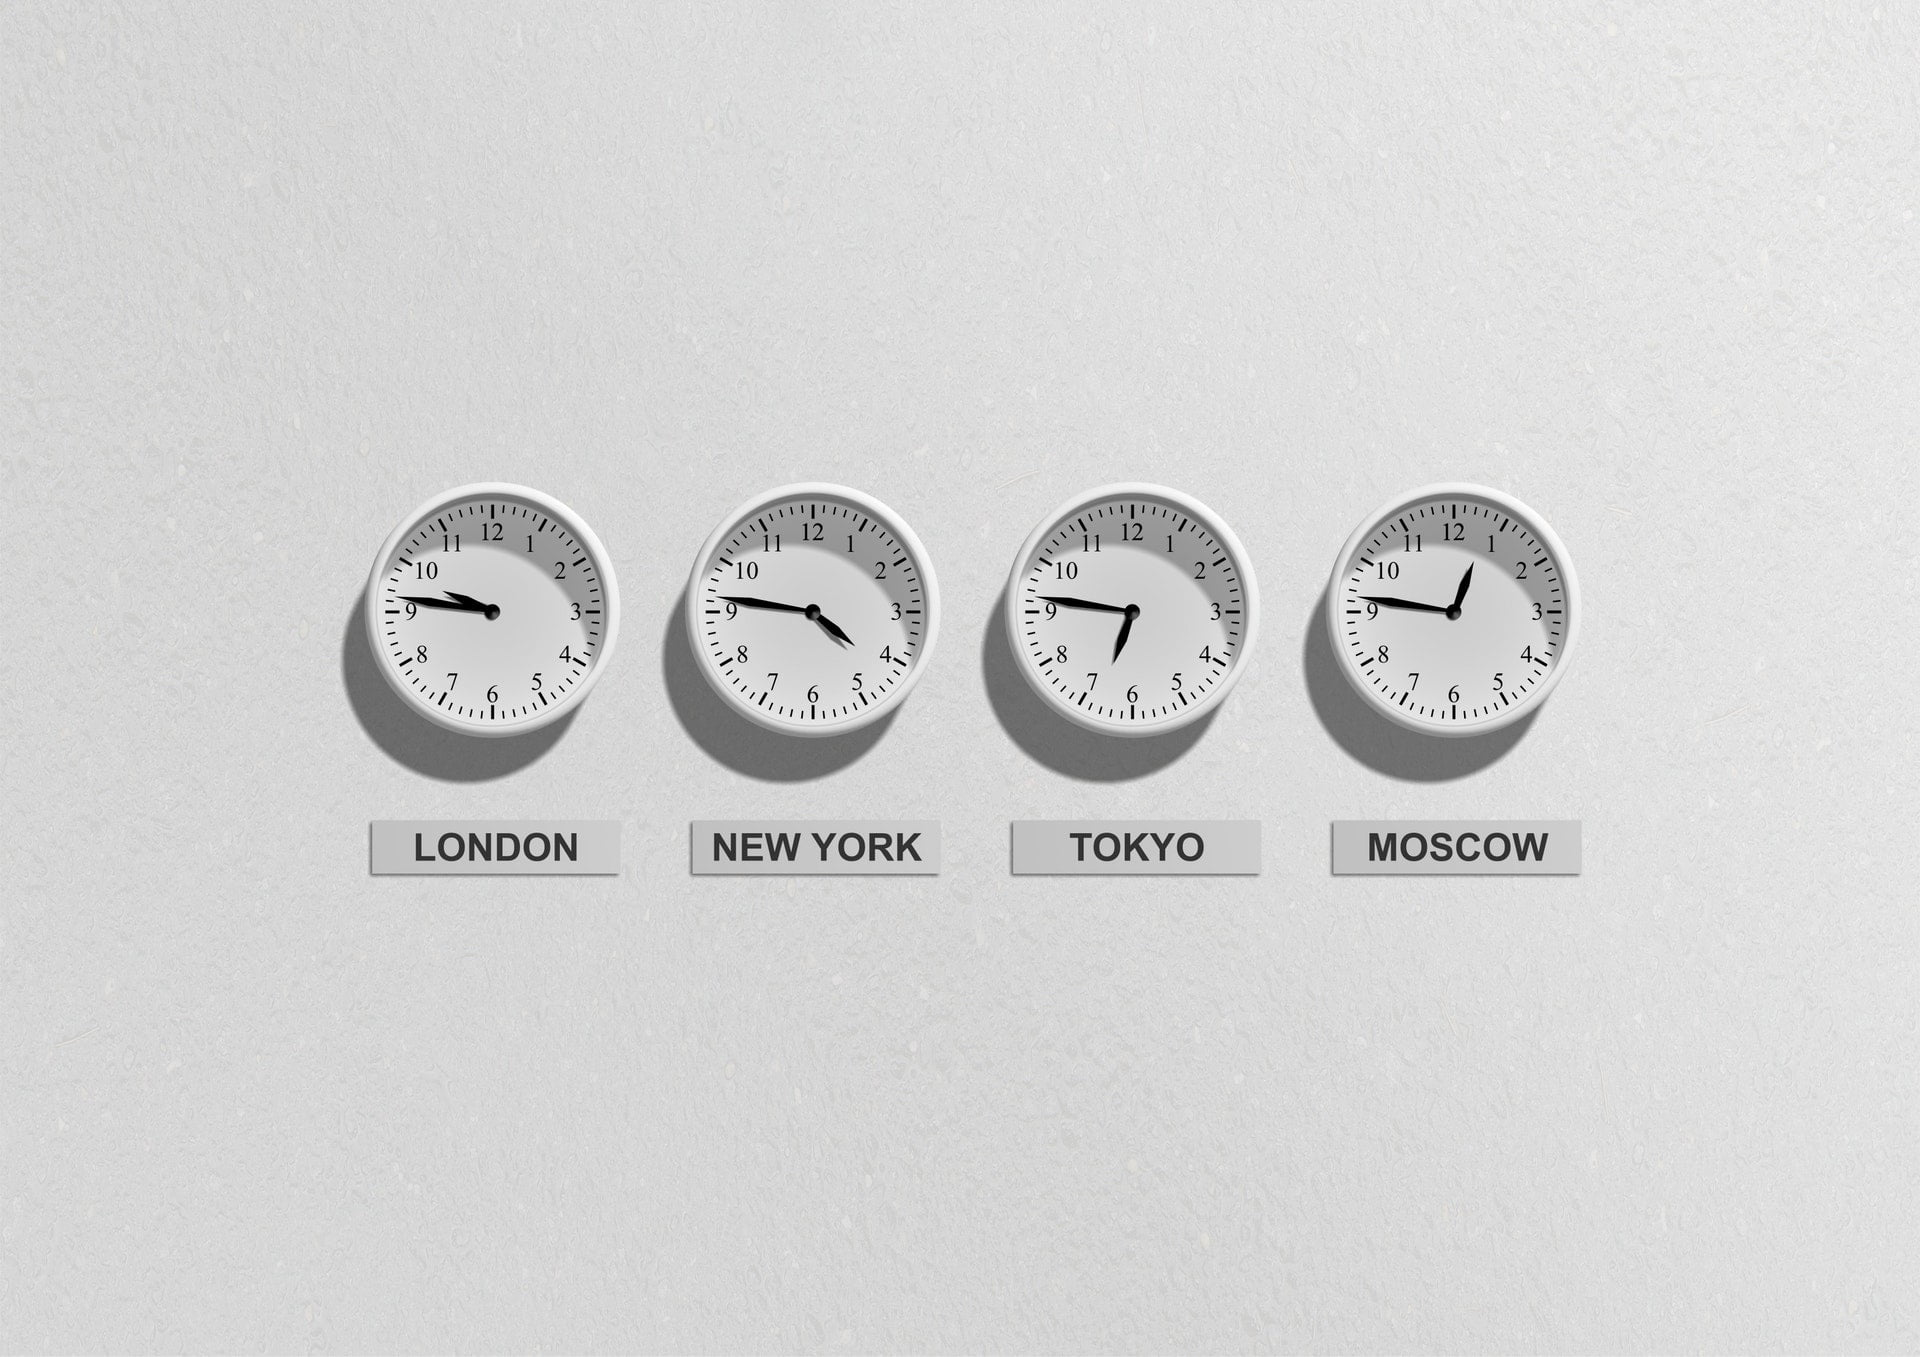 Business time clocks